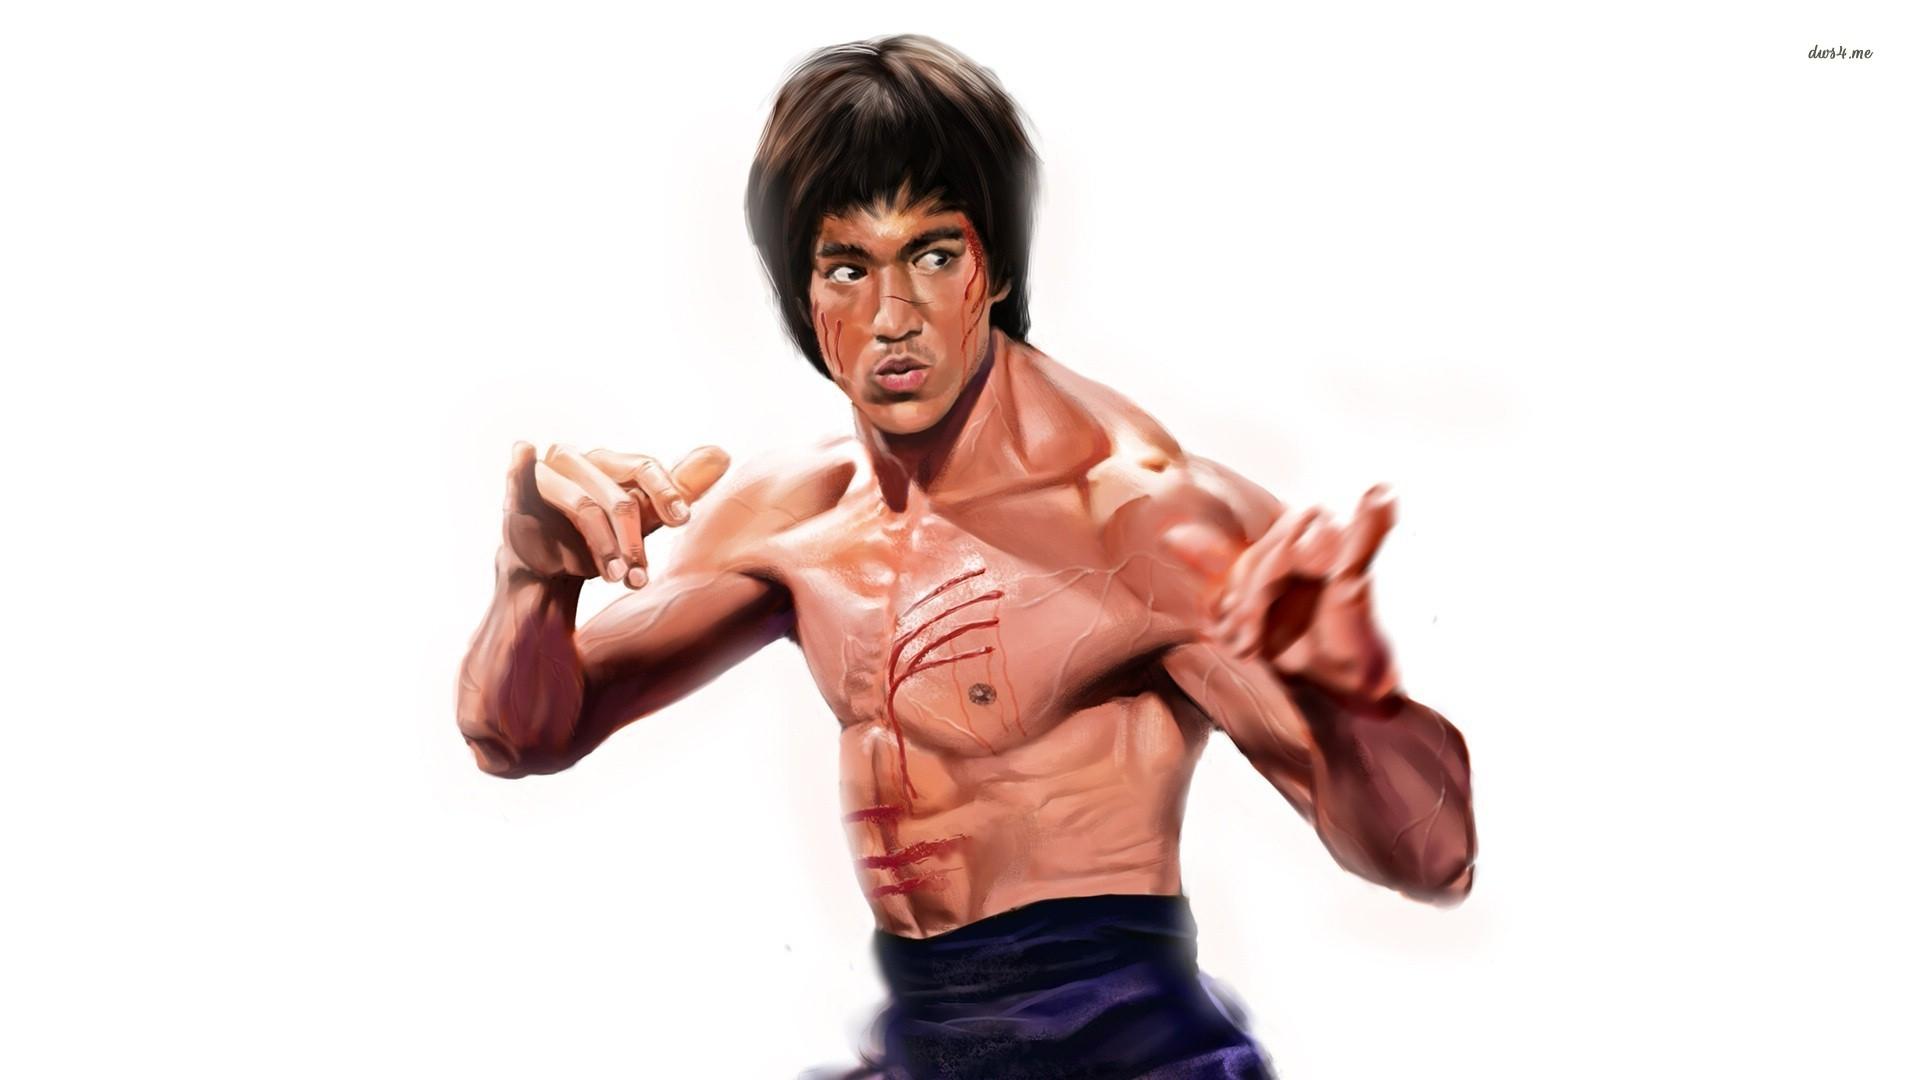 Bruce Lee Wallpaper 23